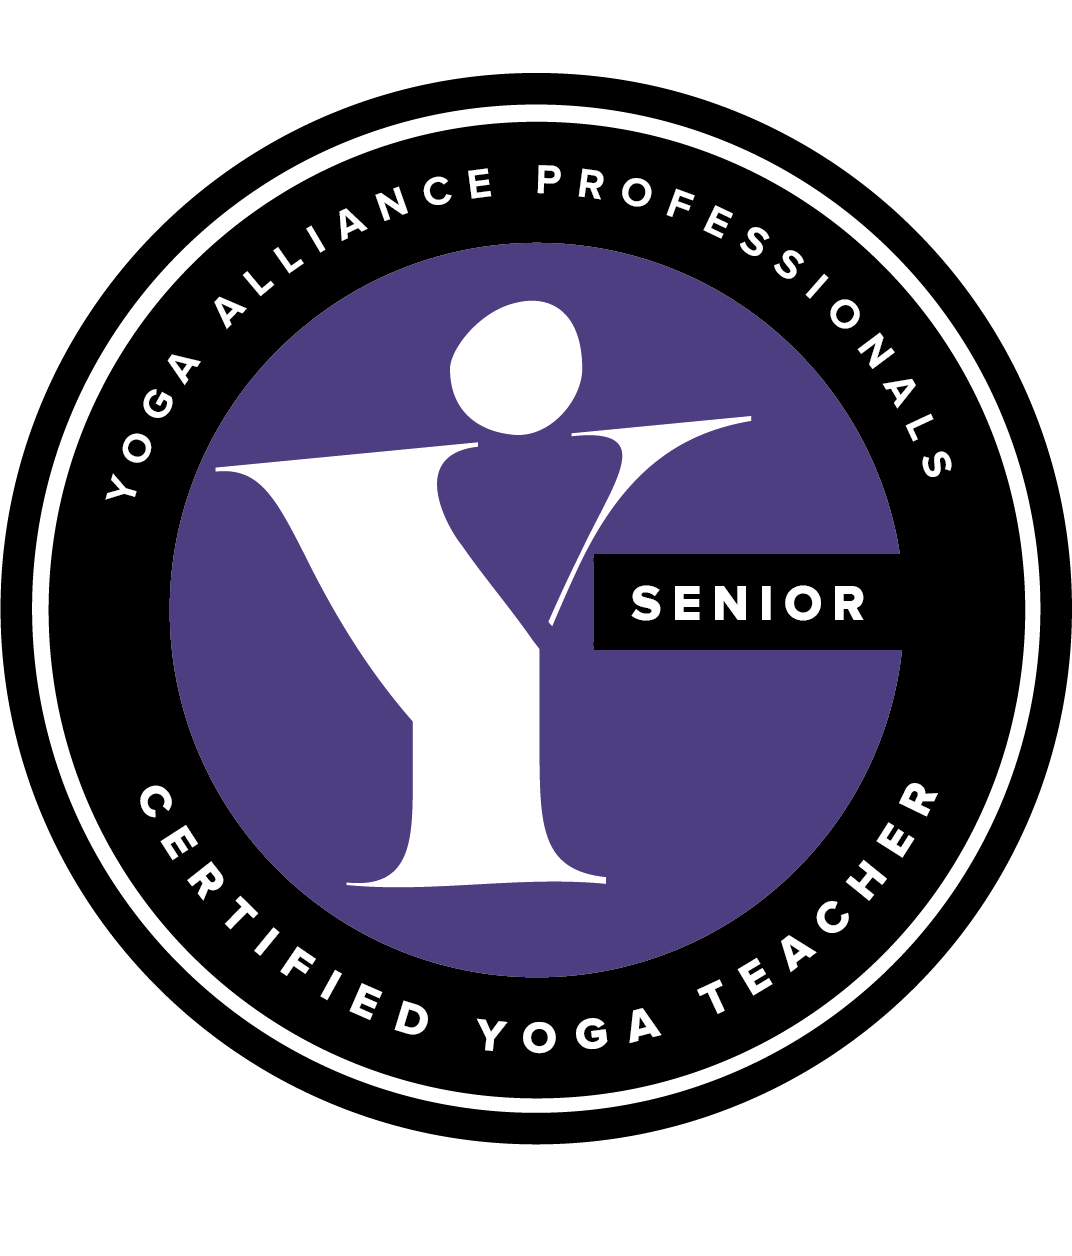 lucia ragazzi yoga - yap yoga alliance professional - senior teacher